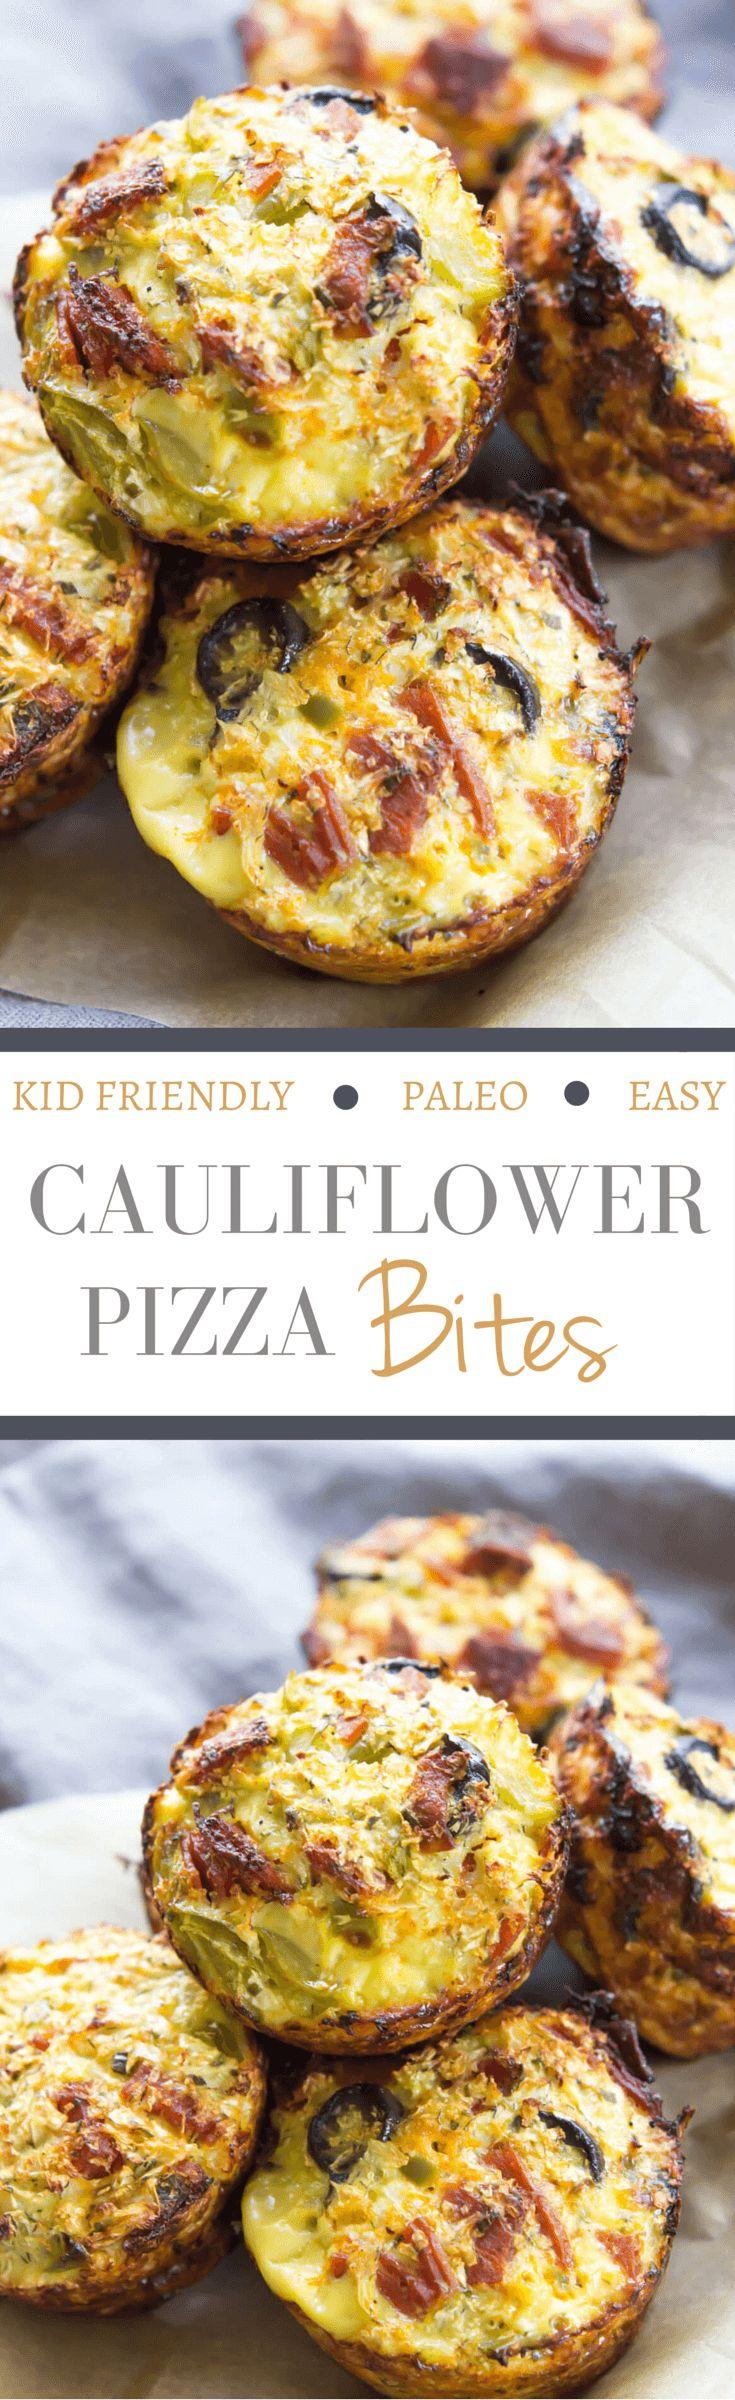 Blue apron cauliflower pizza - Cauliflower Pizza Bites